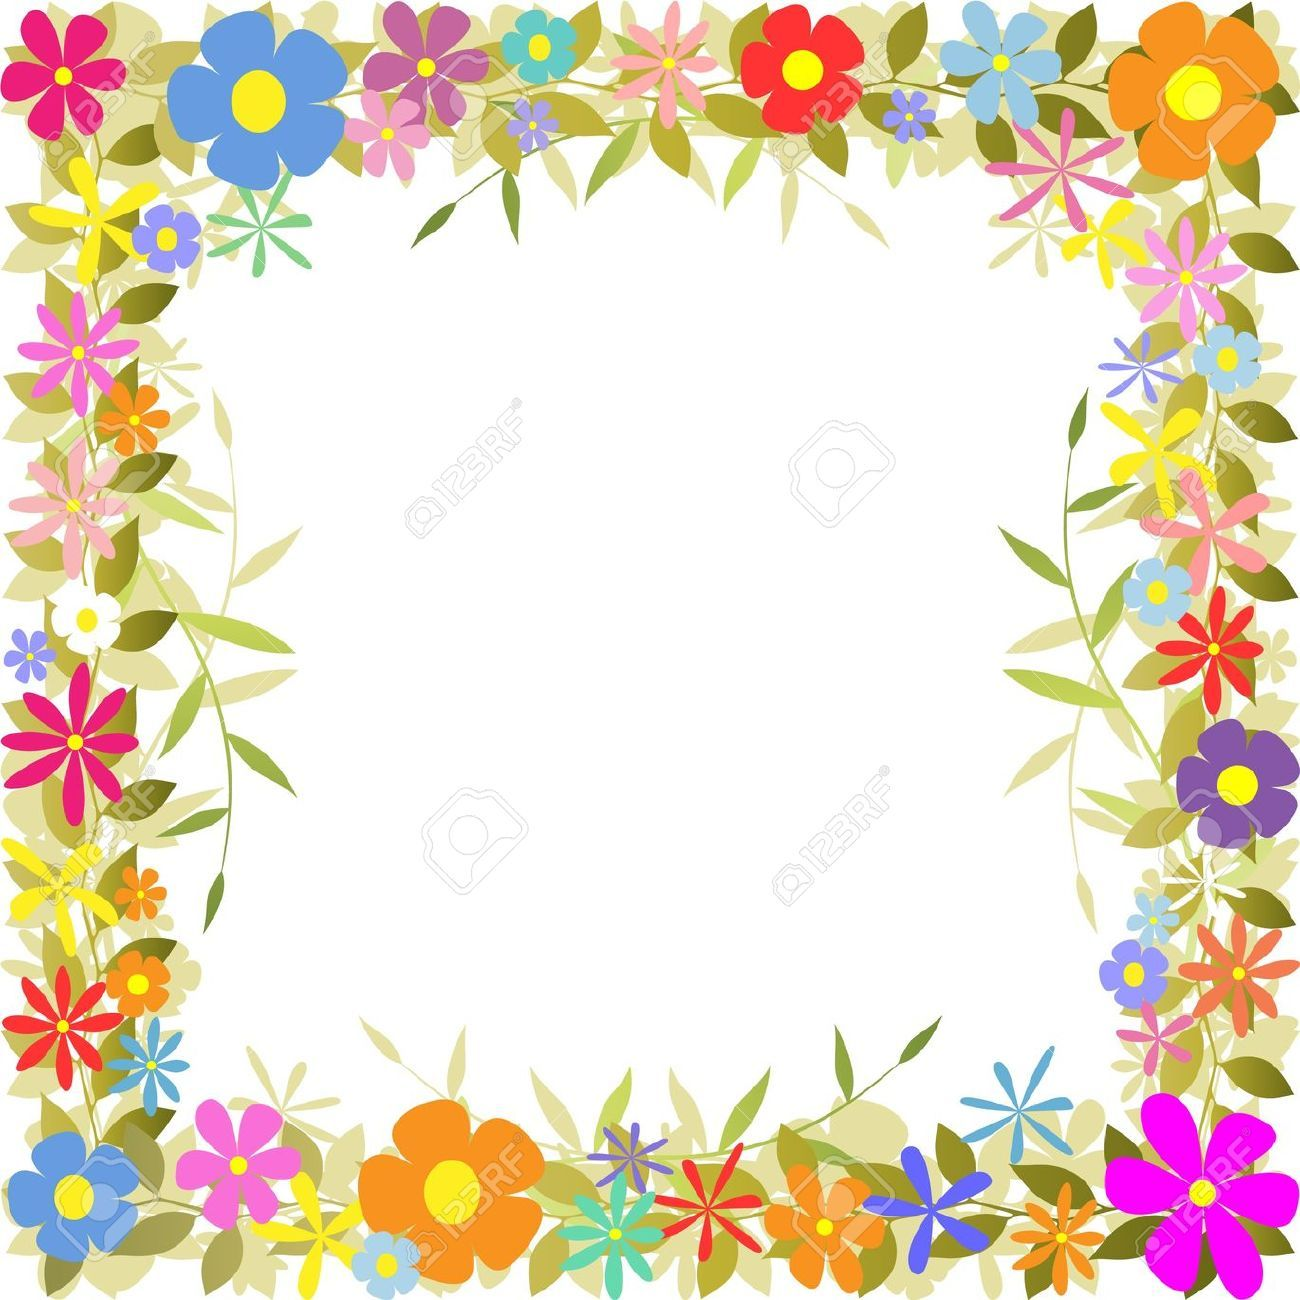 marcos para hojas blancas - Buscar con Google | preescolar ...